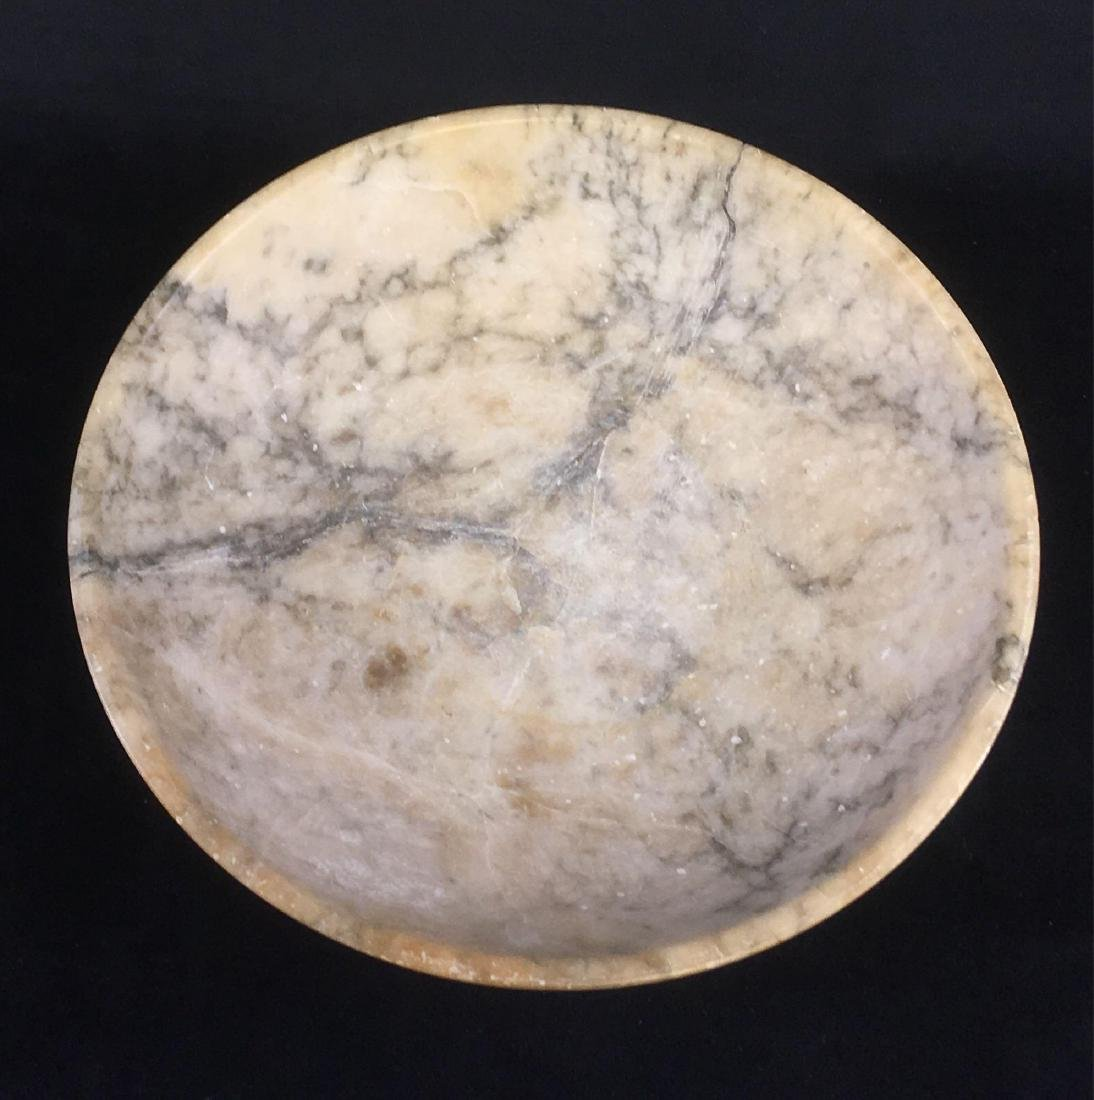 Vintage Marble Kitchen Decor Bowl - 2